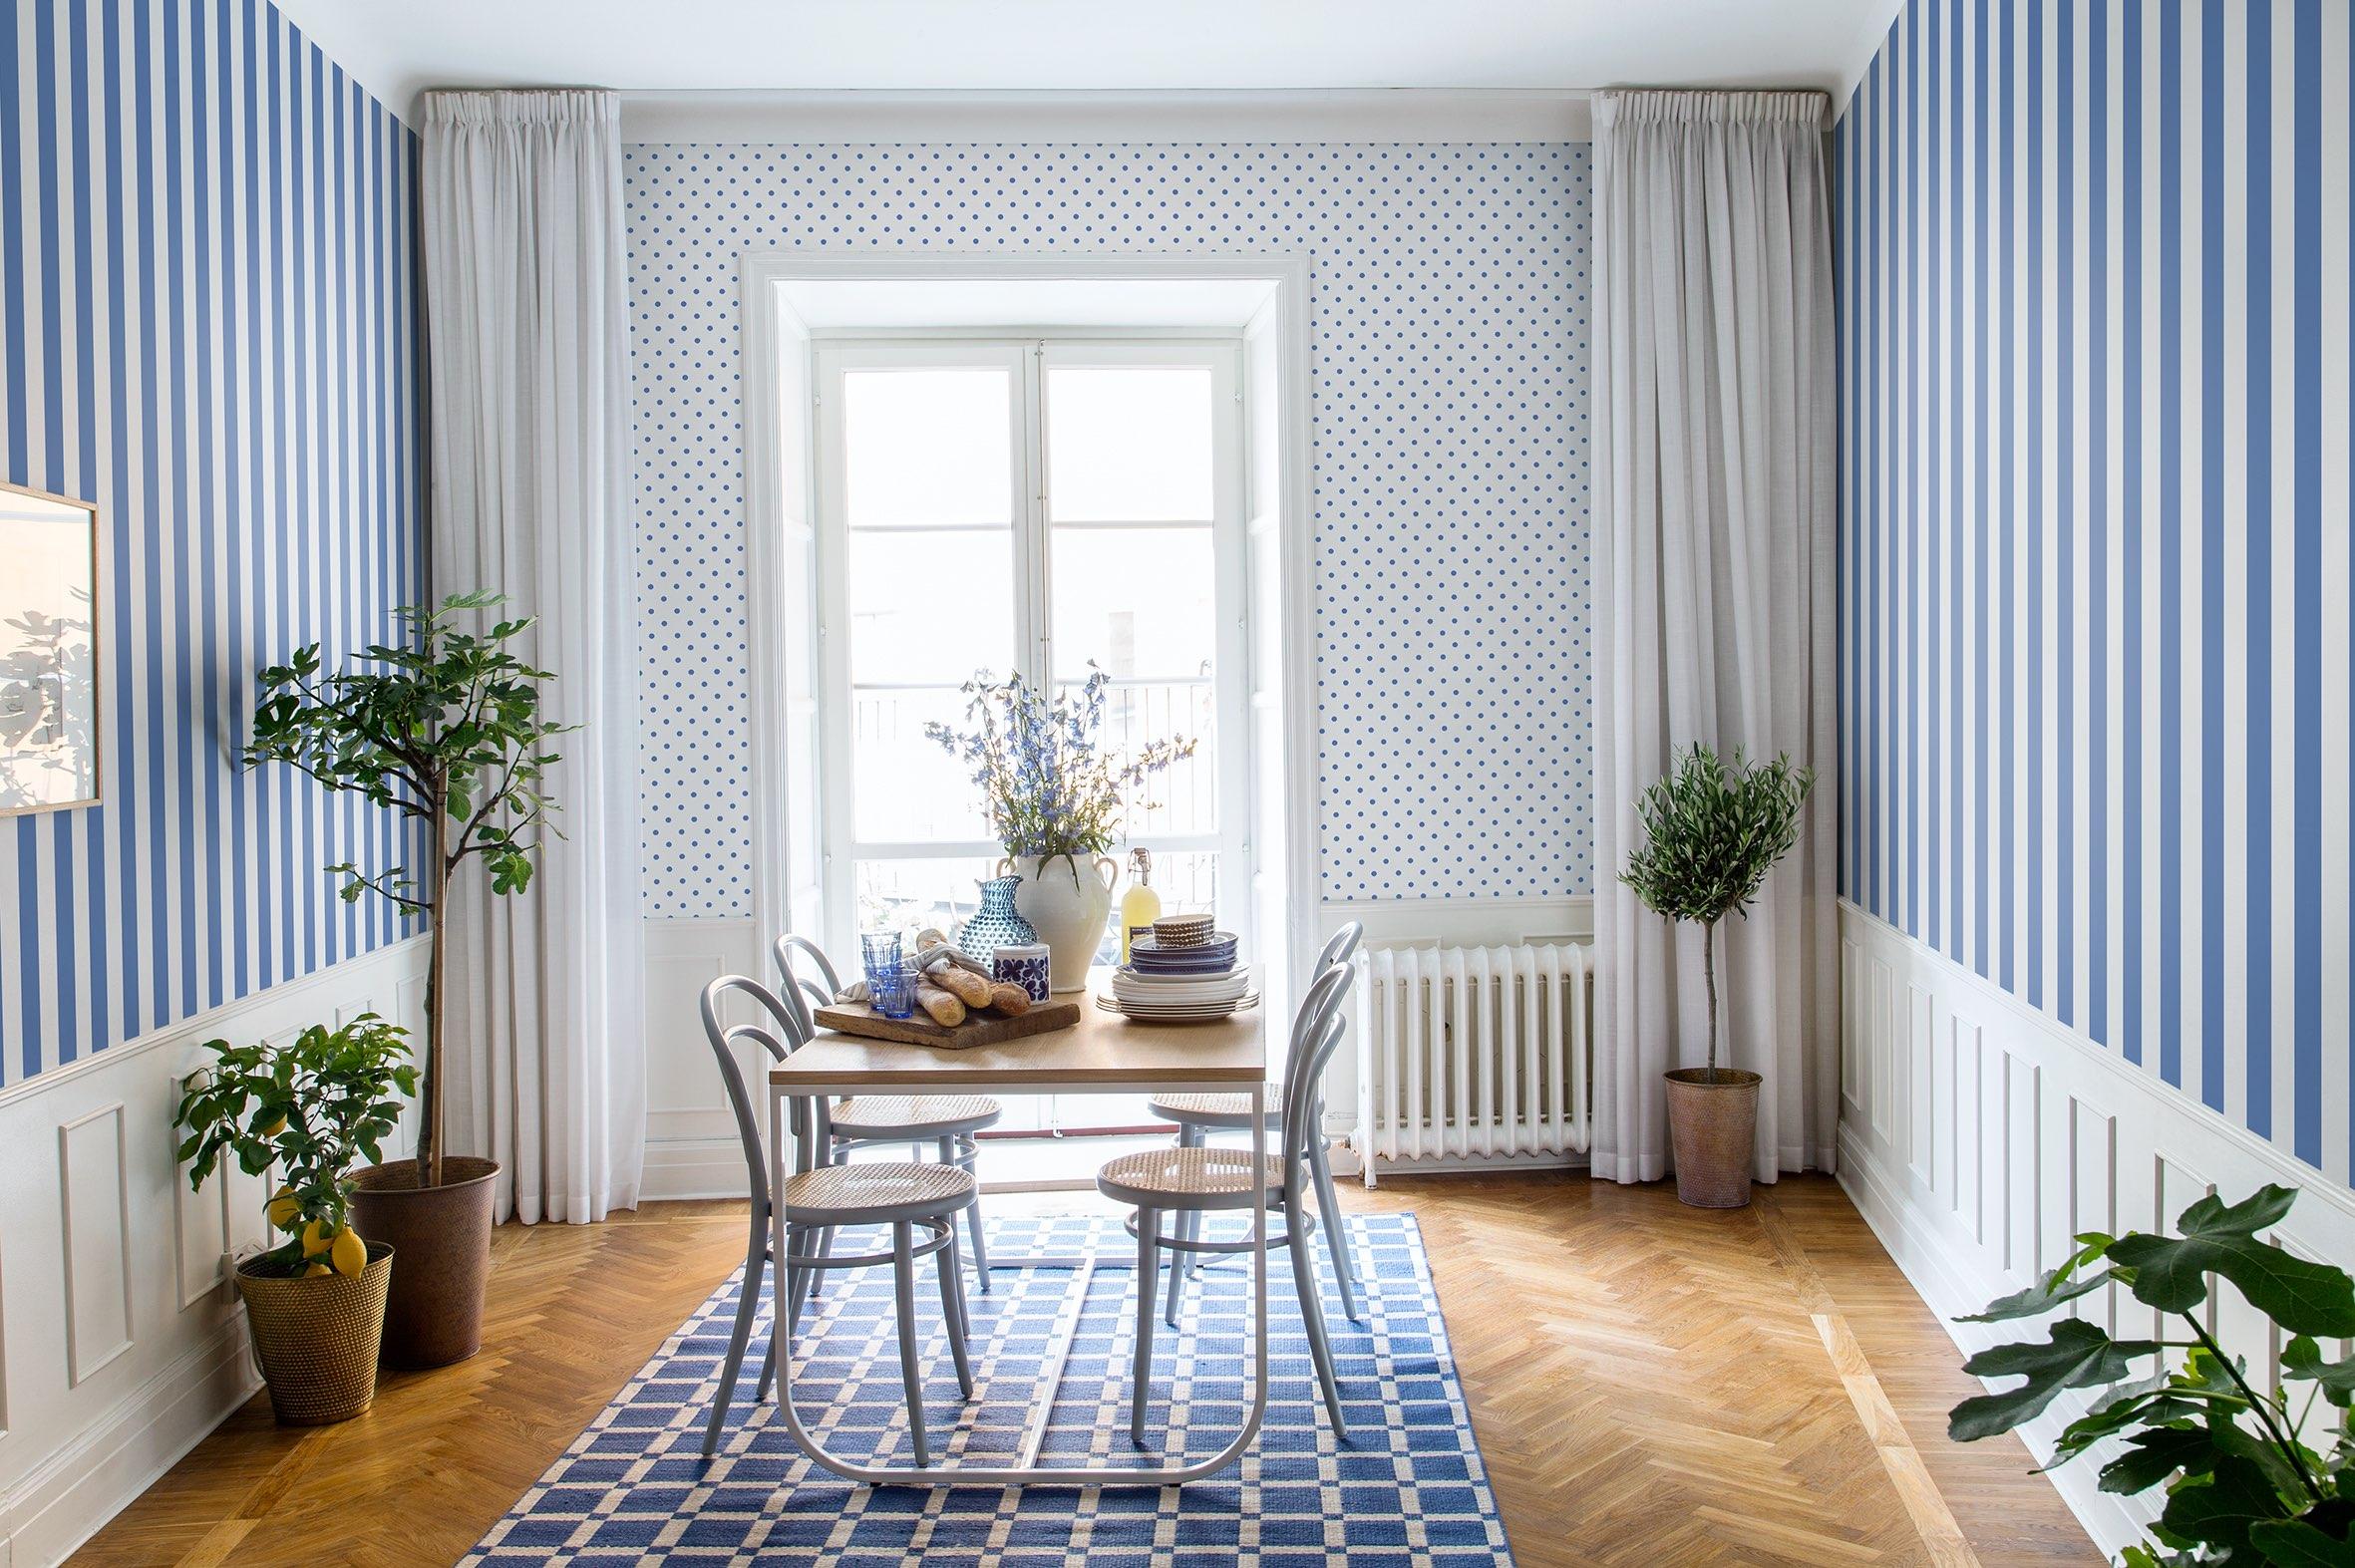 Wallpaper for walls decor maison 2362x1573